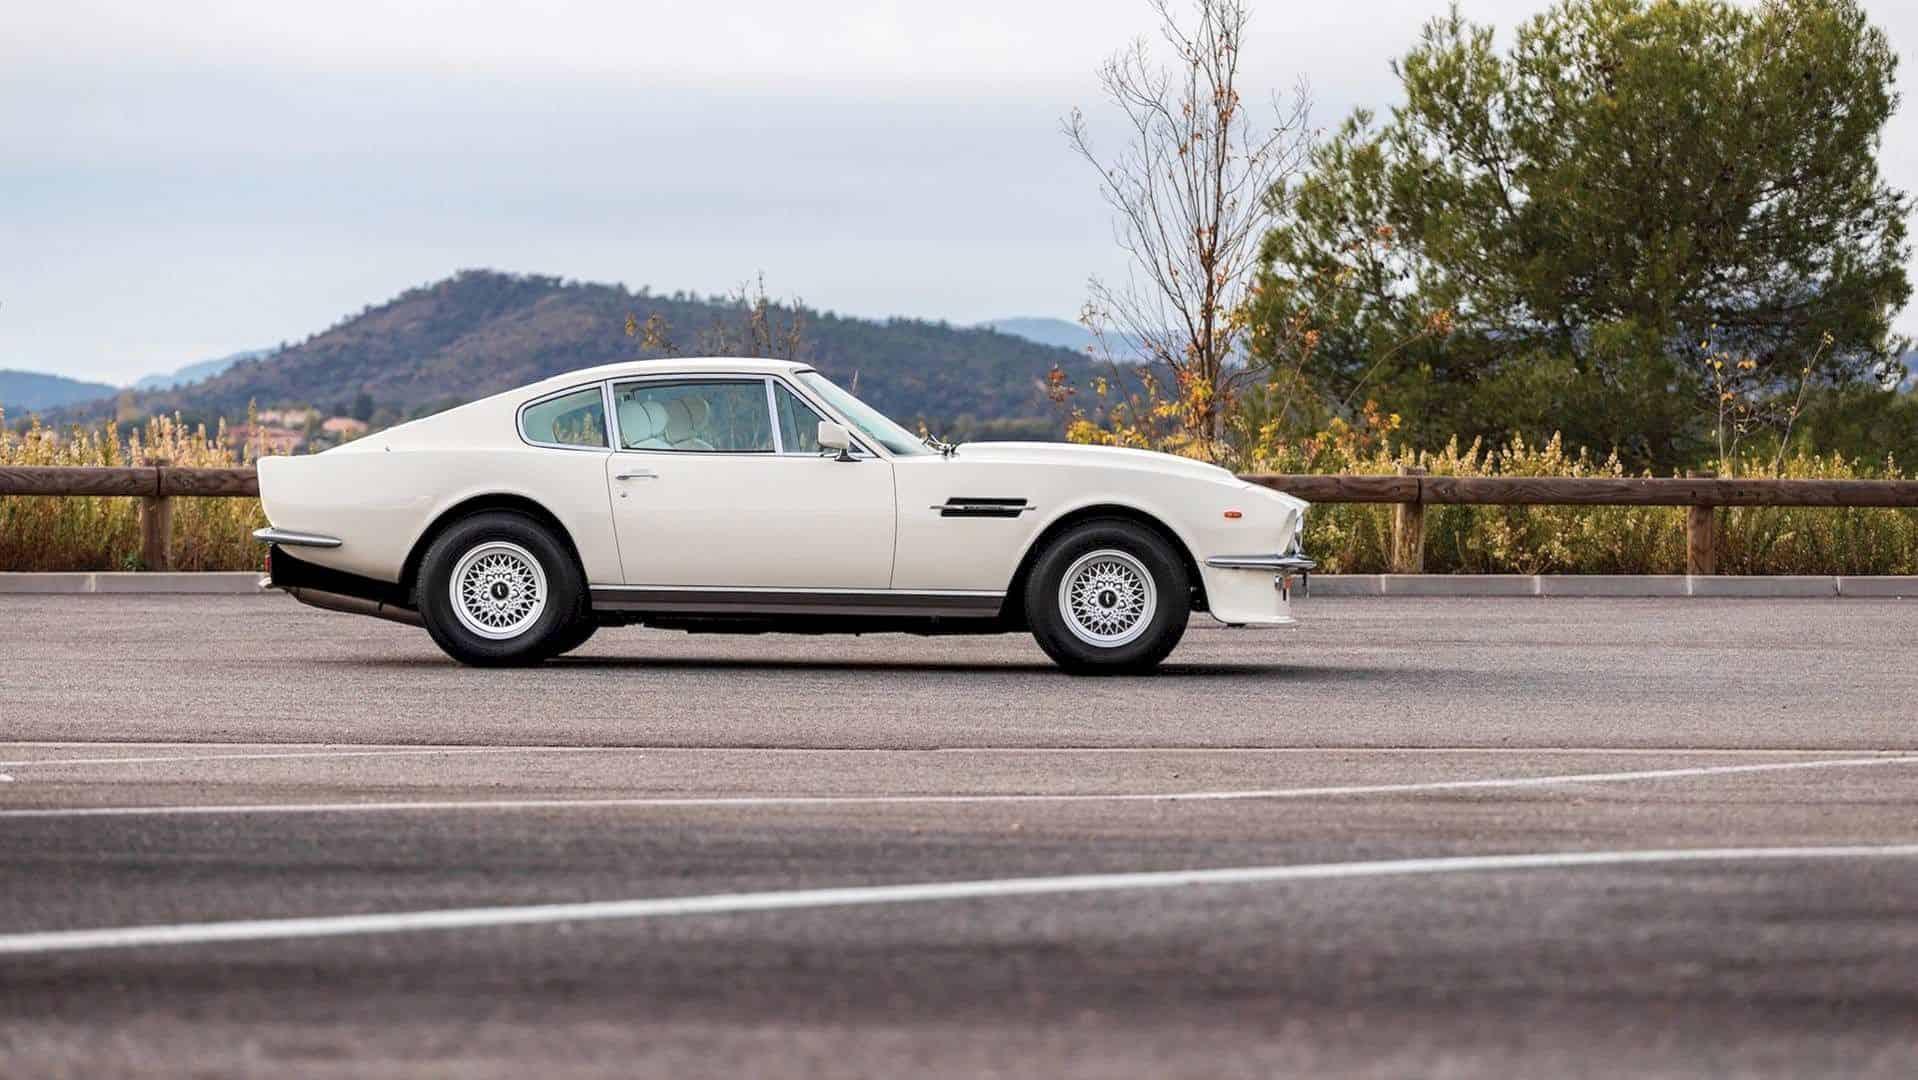 1983 Aston Martin V8 Vantage V580 6